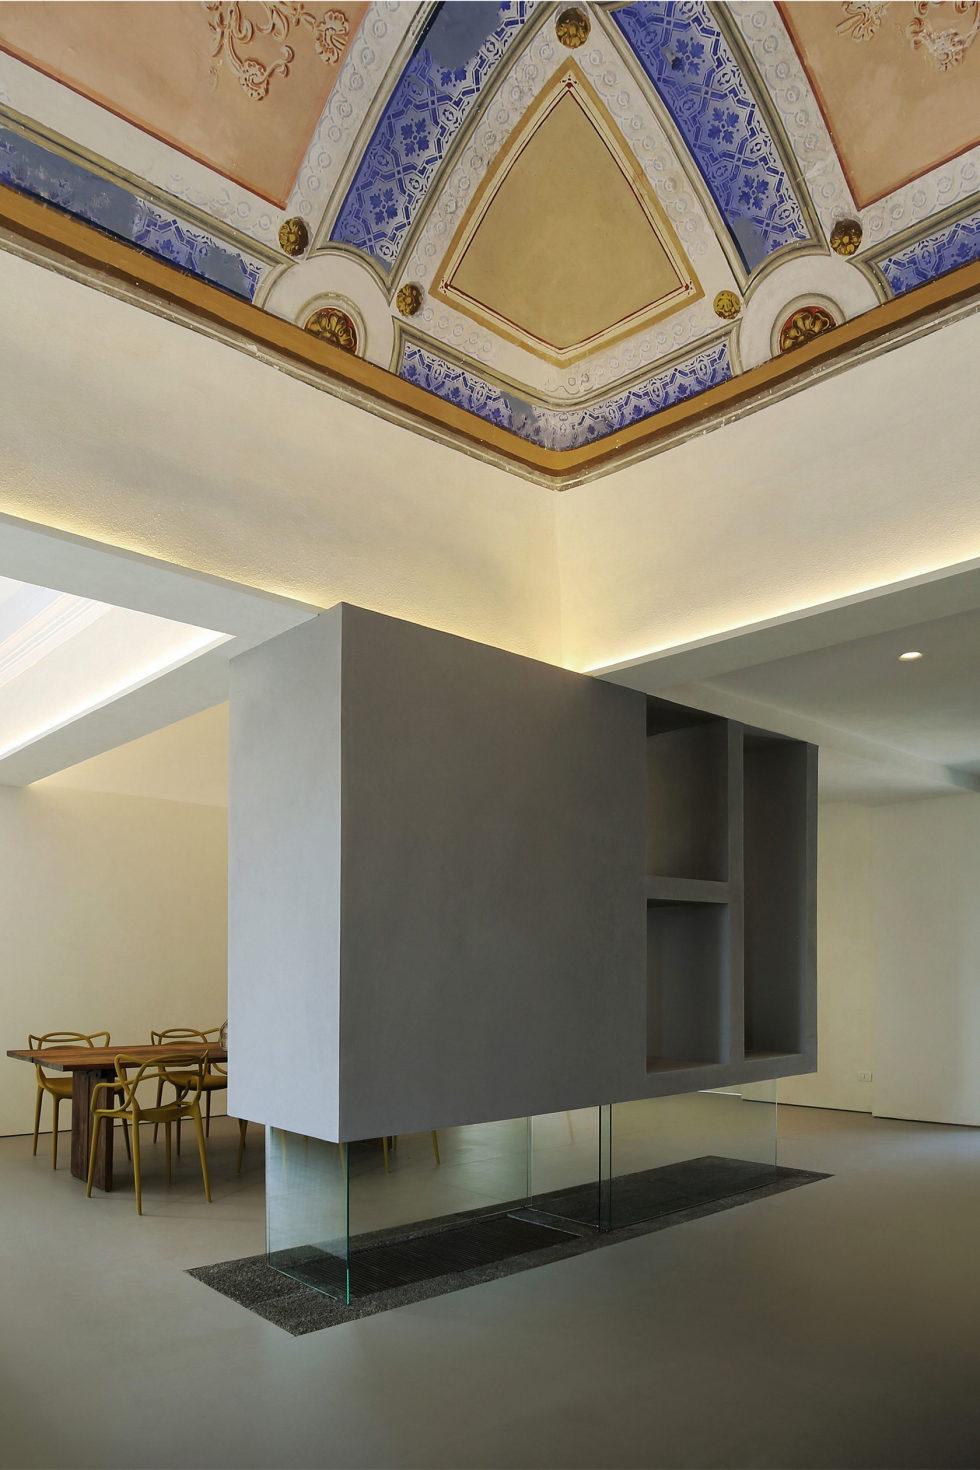 CRV Villa In Italy From ACA Amore Campione Architettura 15